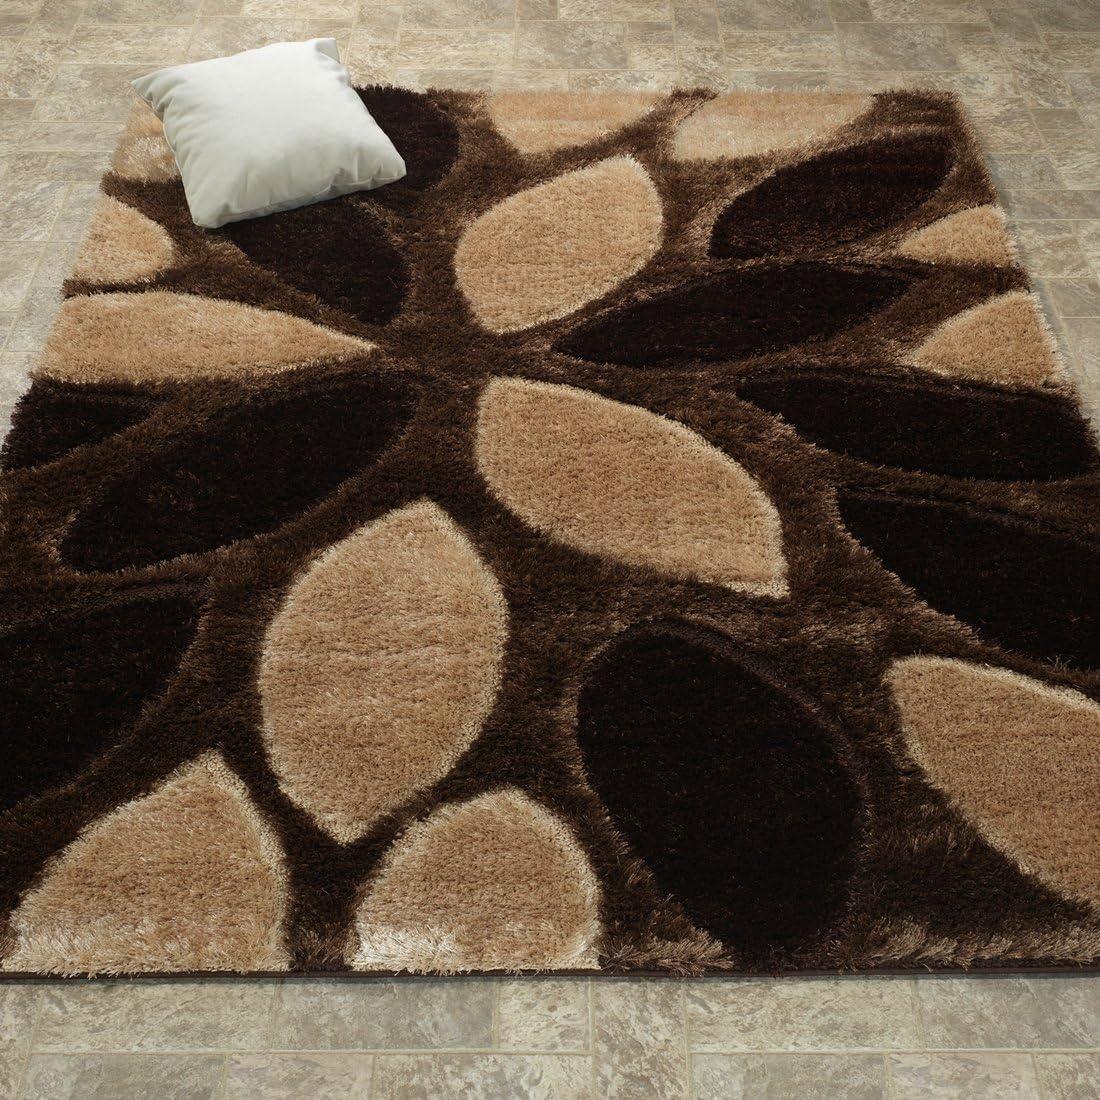 Ottomanson Beige Brown Shag Area Rug, 5 3 x 7 3 , Floral